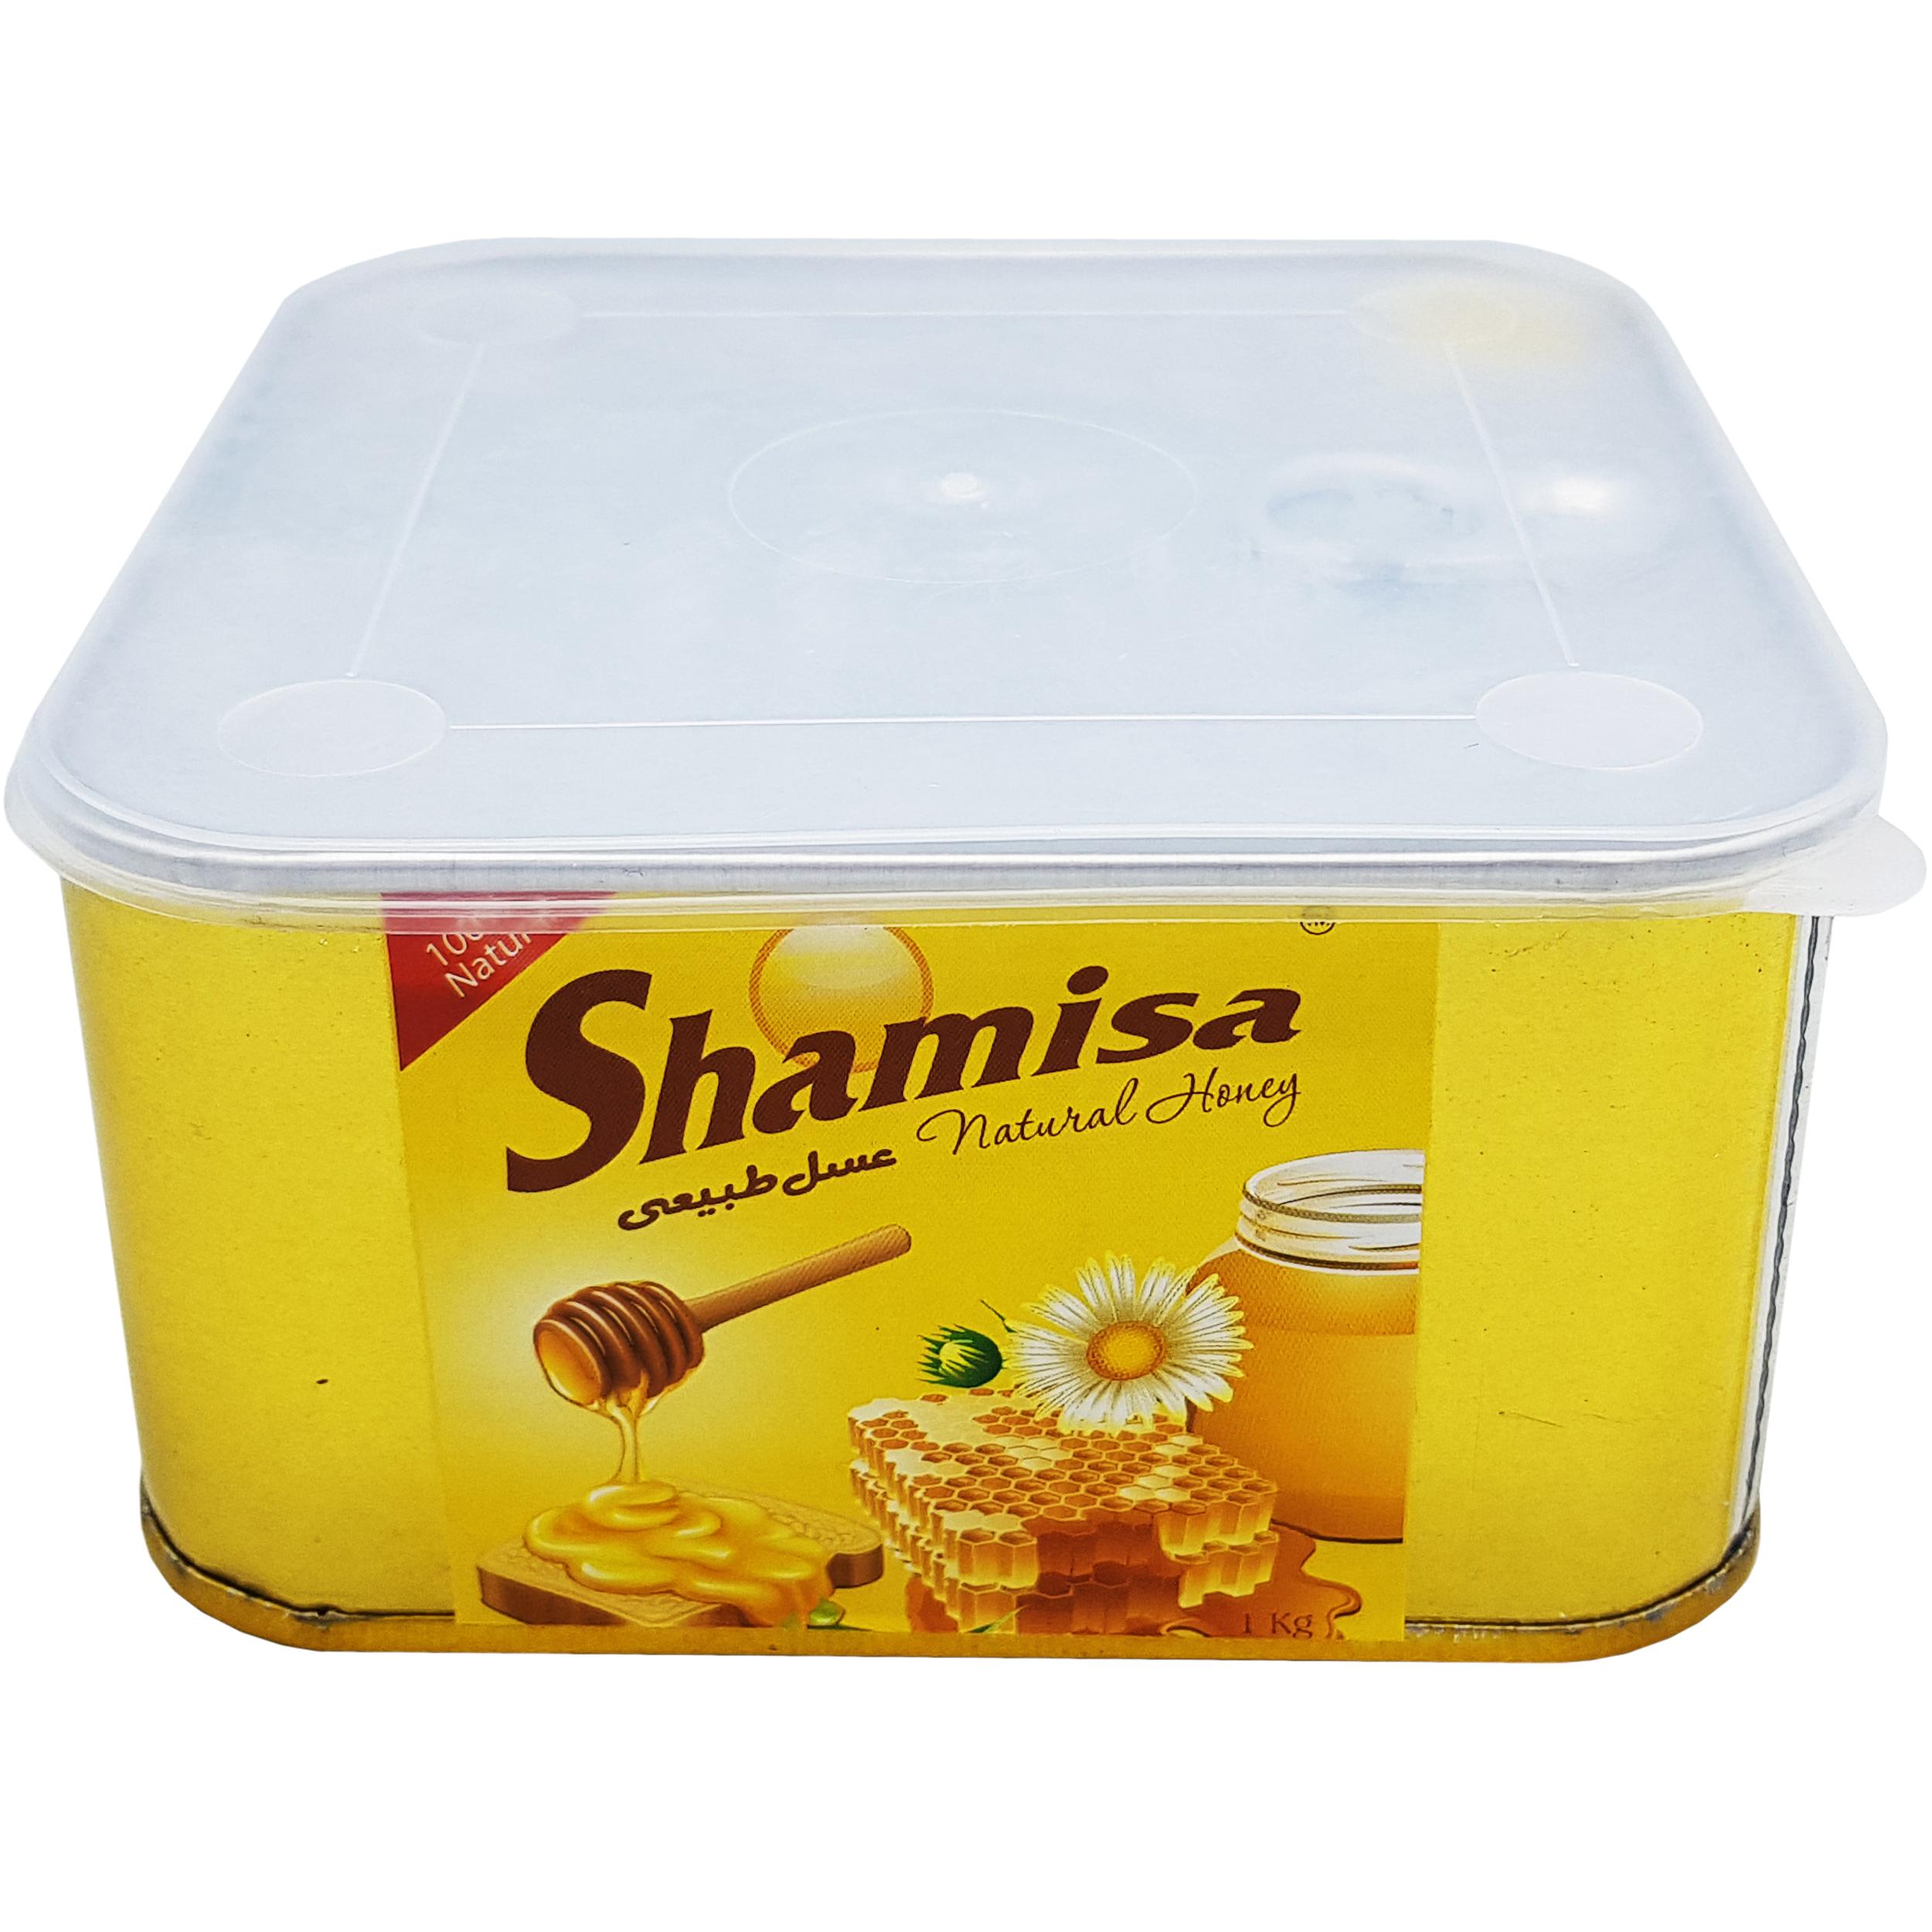 عسل طبیعی شمیسا - 1 کیلوگرم